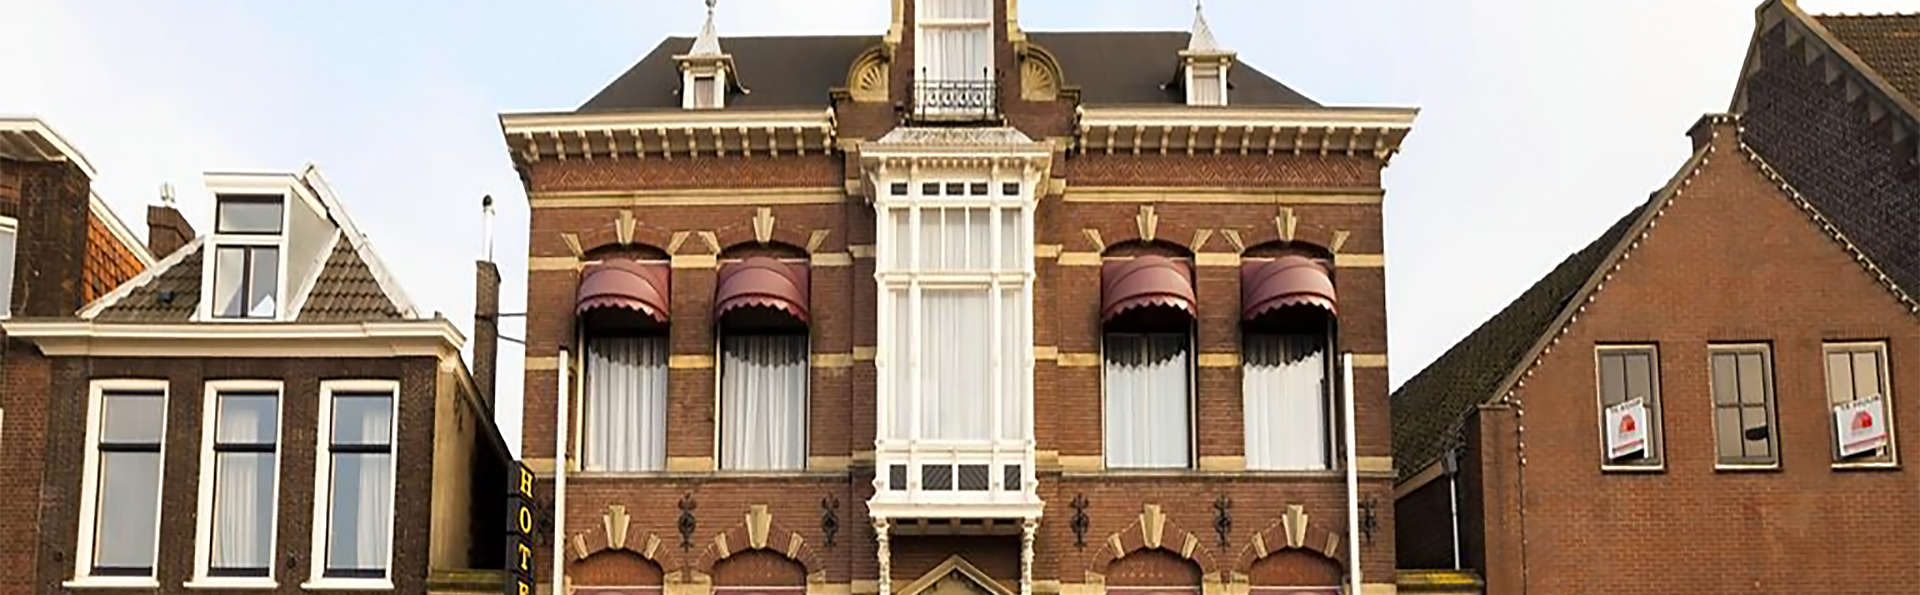 Hotel Dordrecht - EDIT_front.jpg